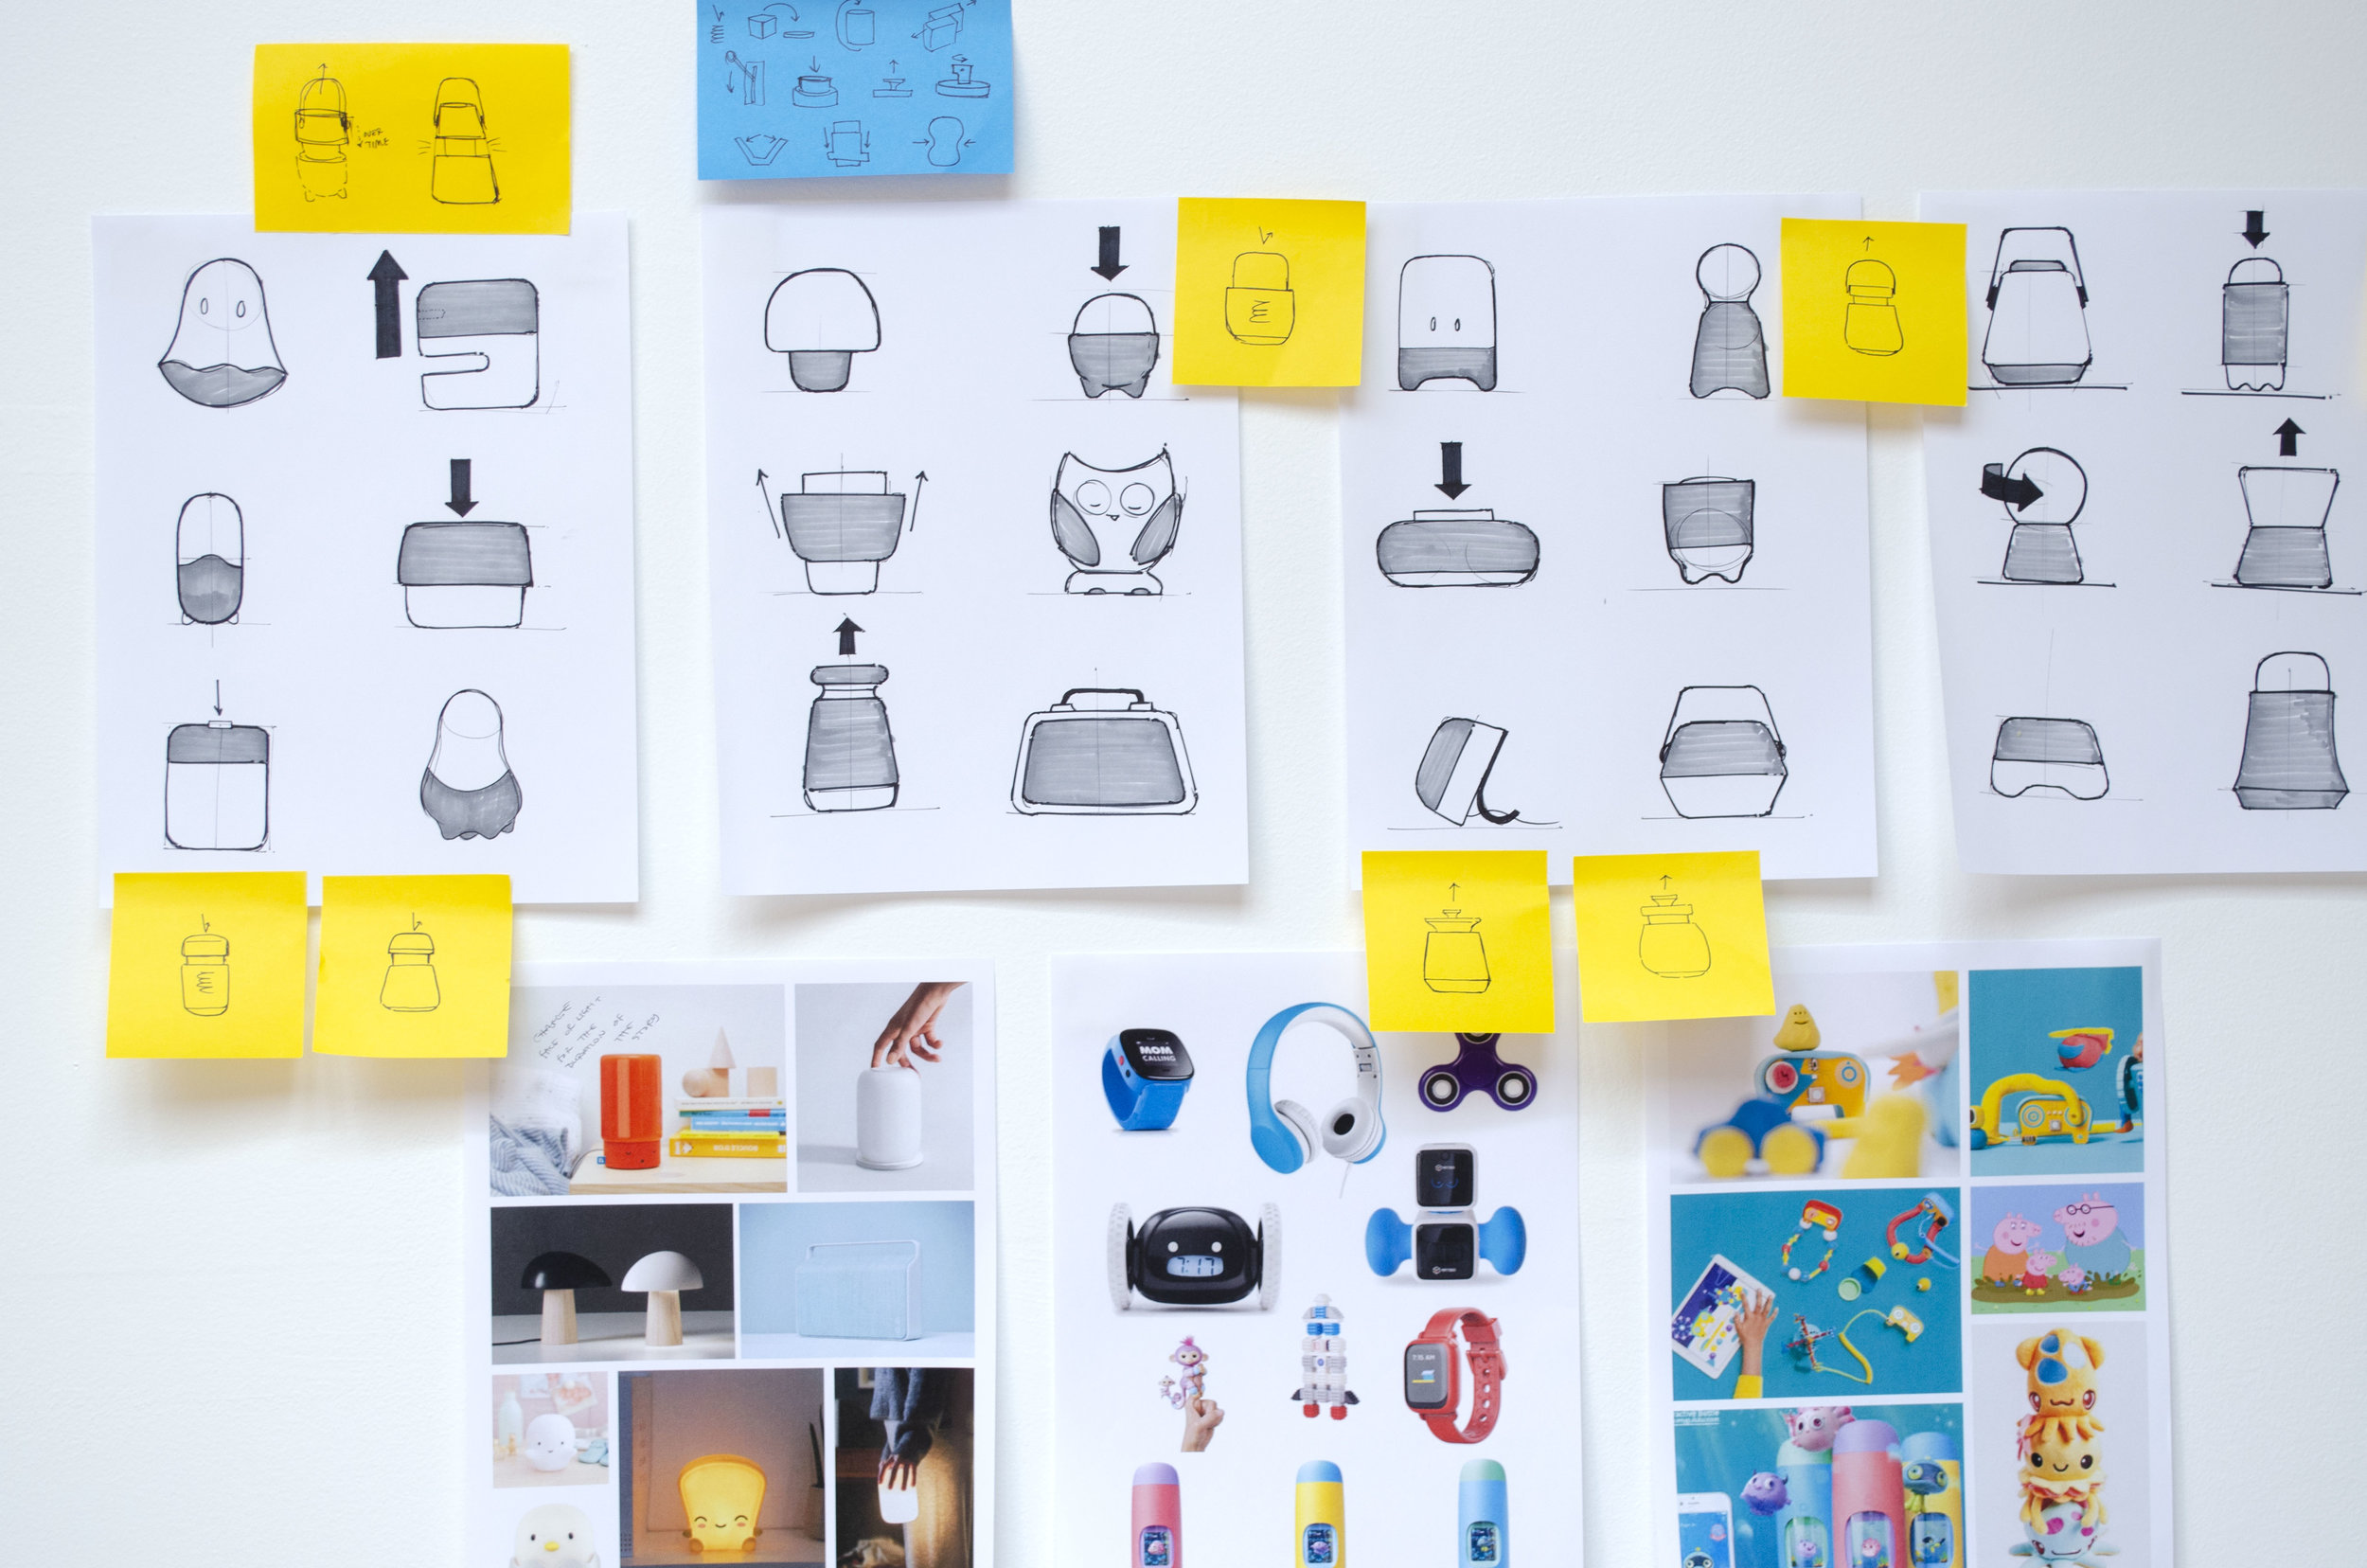 Roger-sketches copy 2.jpg